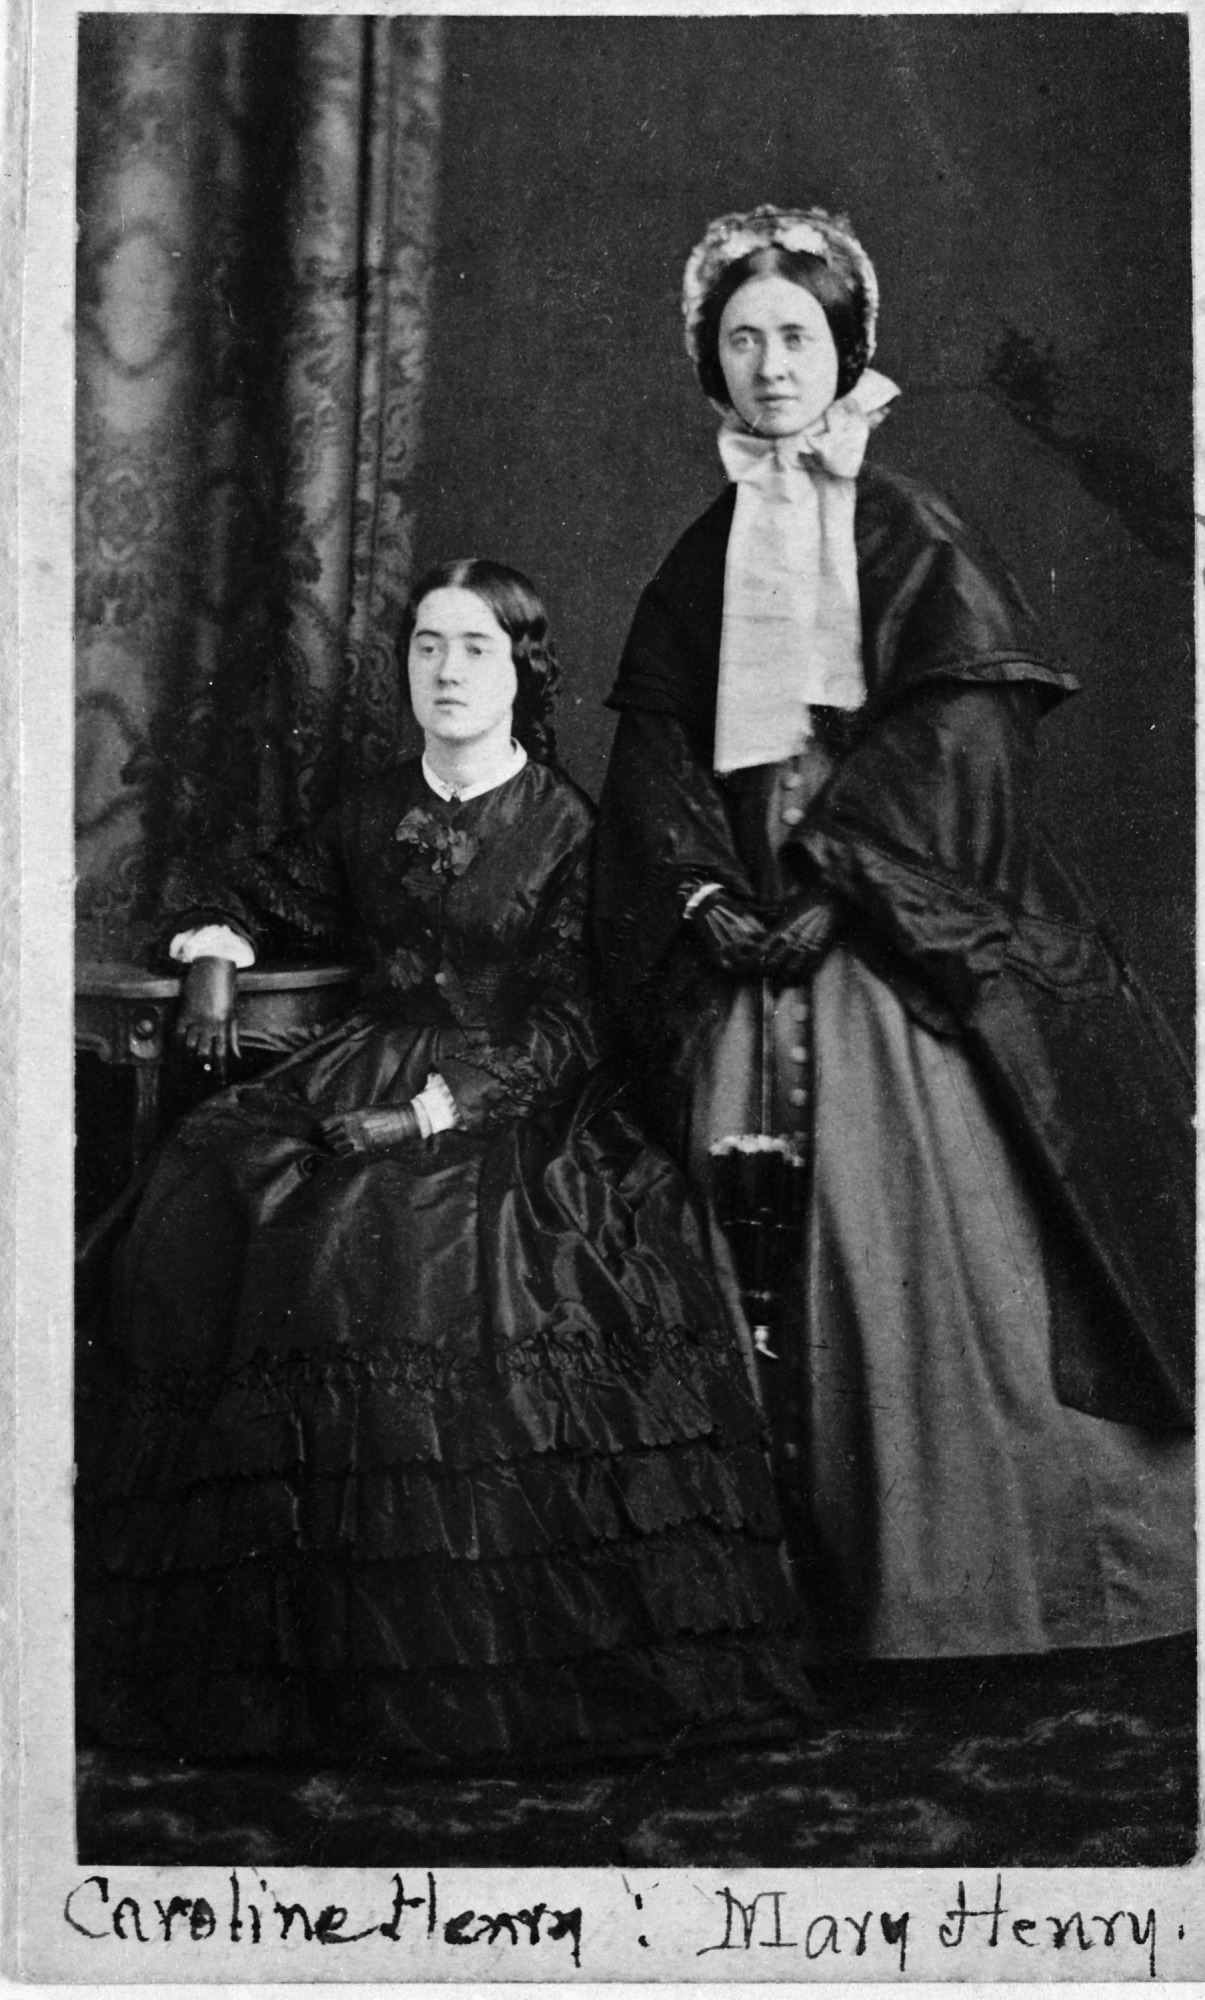 Joseph Henry's Daughters Caroline & Mary